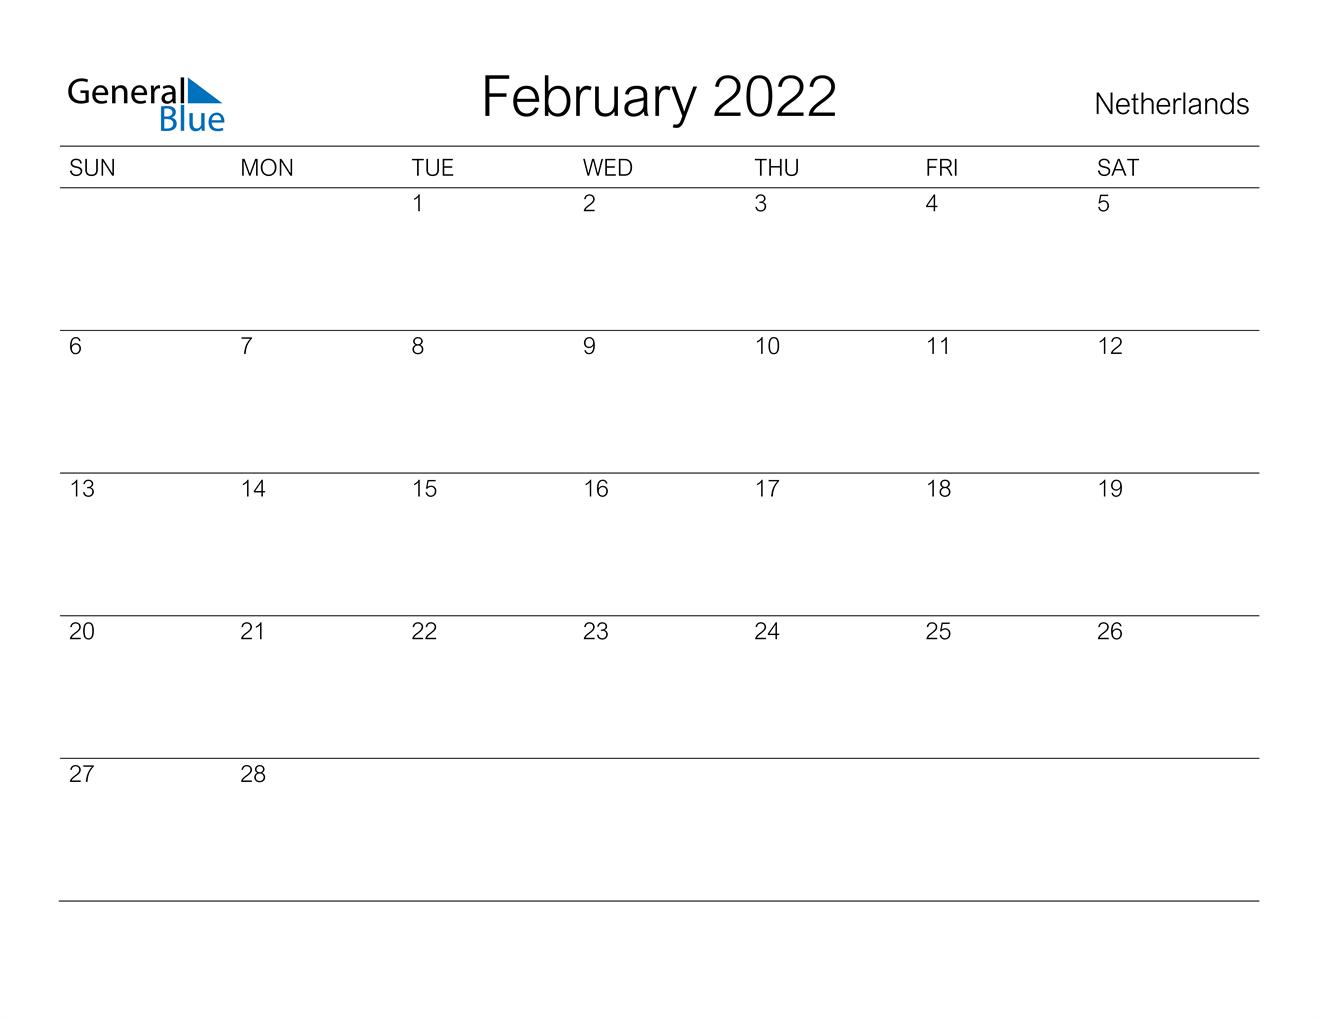 February 2022 Calendar – Netherlands Within February 2022 Calendar Template